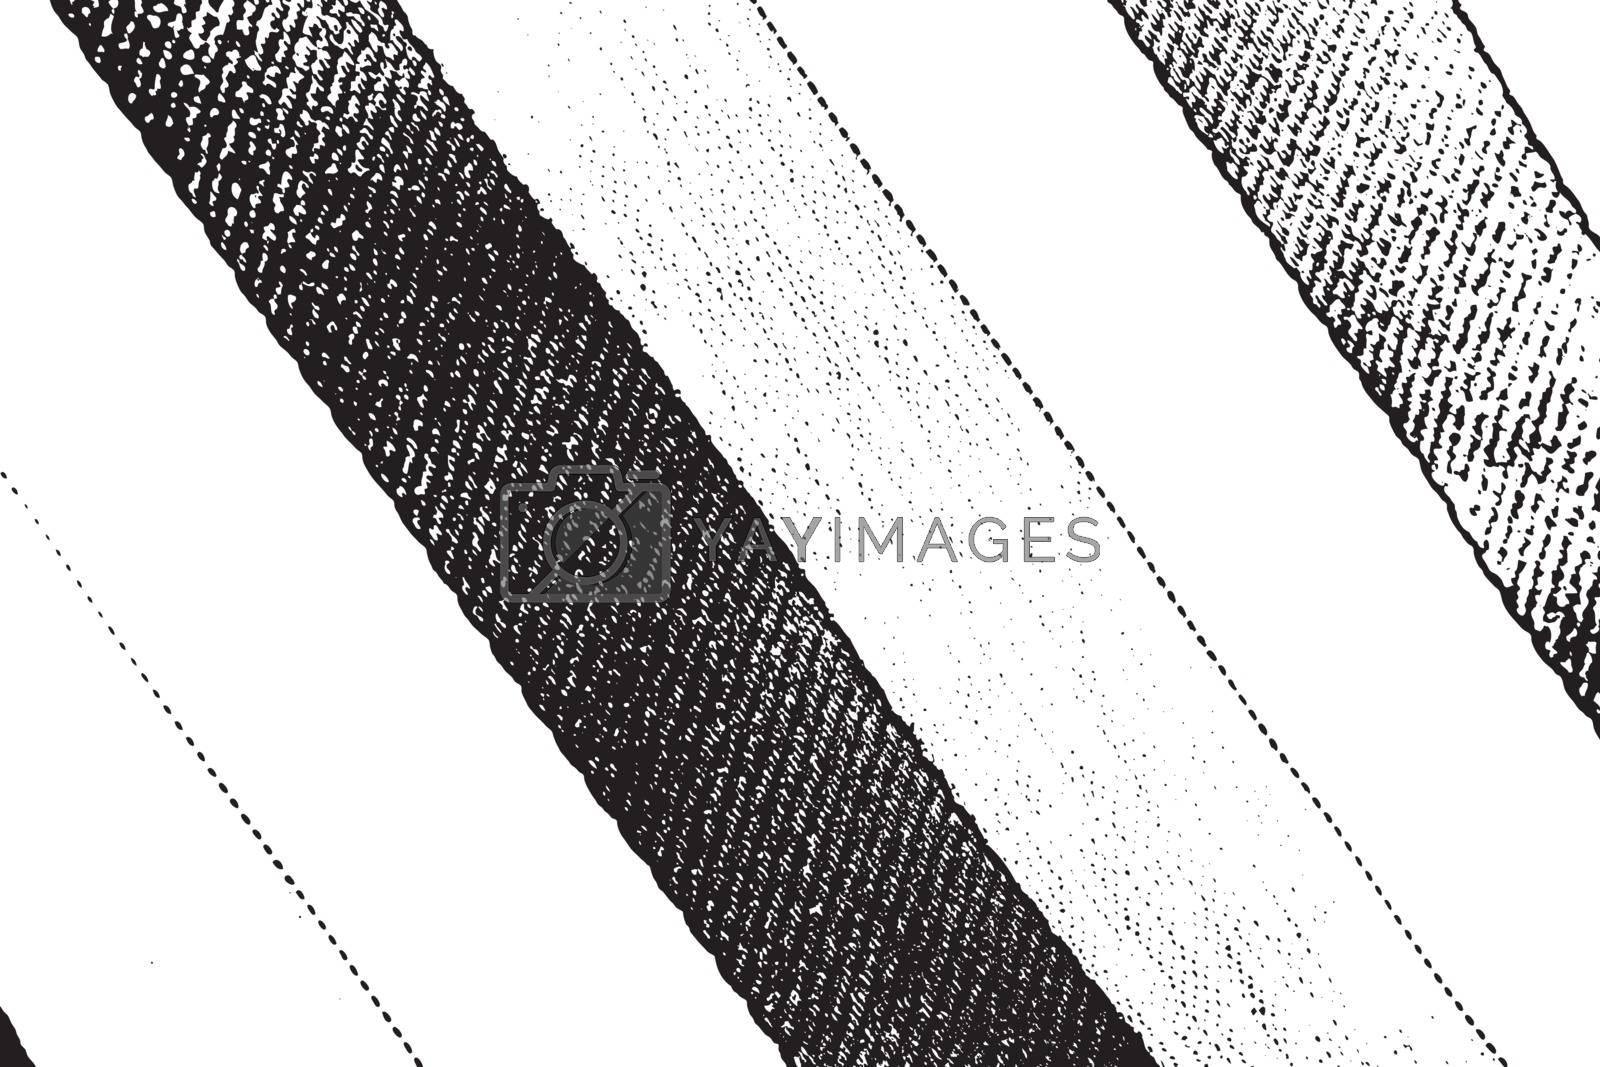 Vector Cracked Texture . Distress Texture . Grunge Texture . Vector Dirt Texture . Overlay Texture